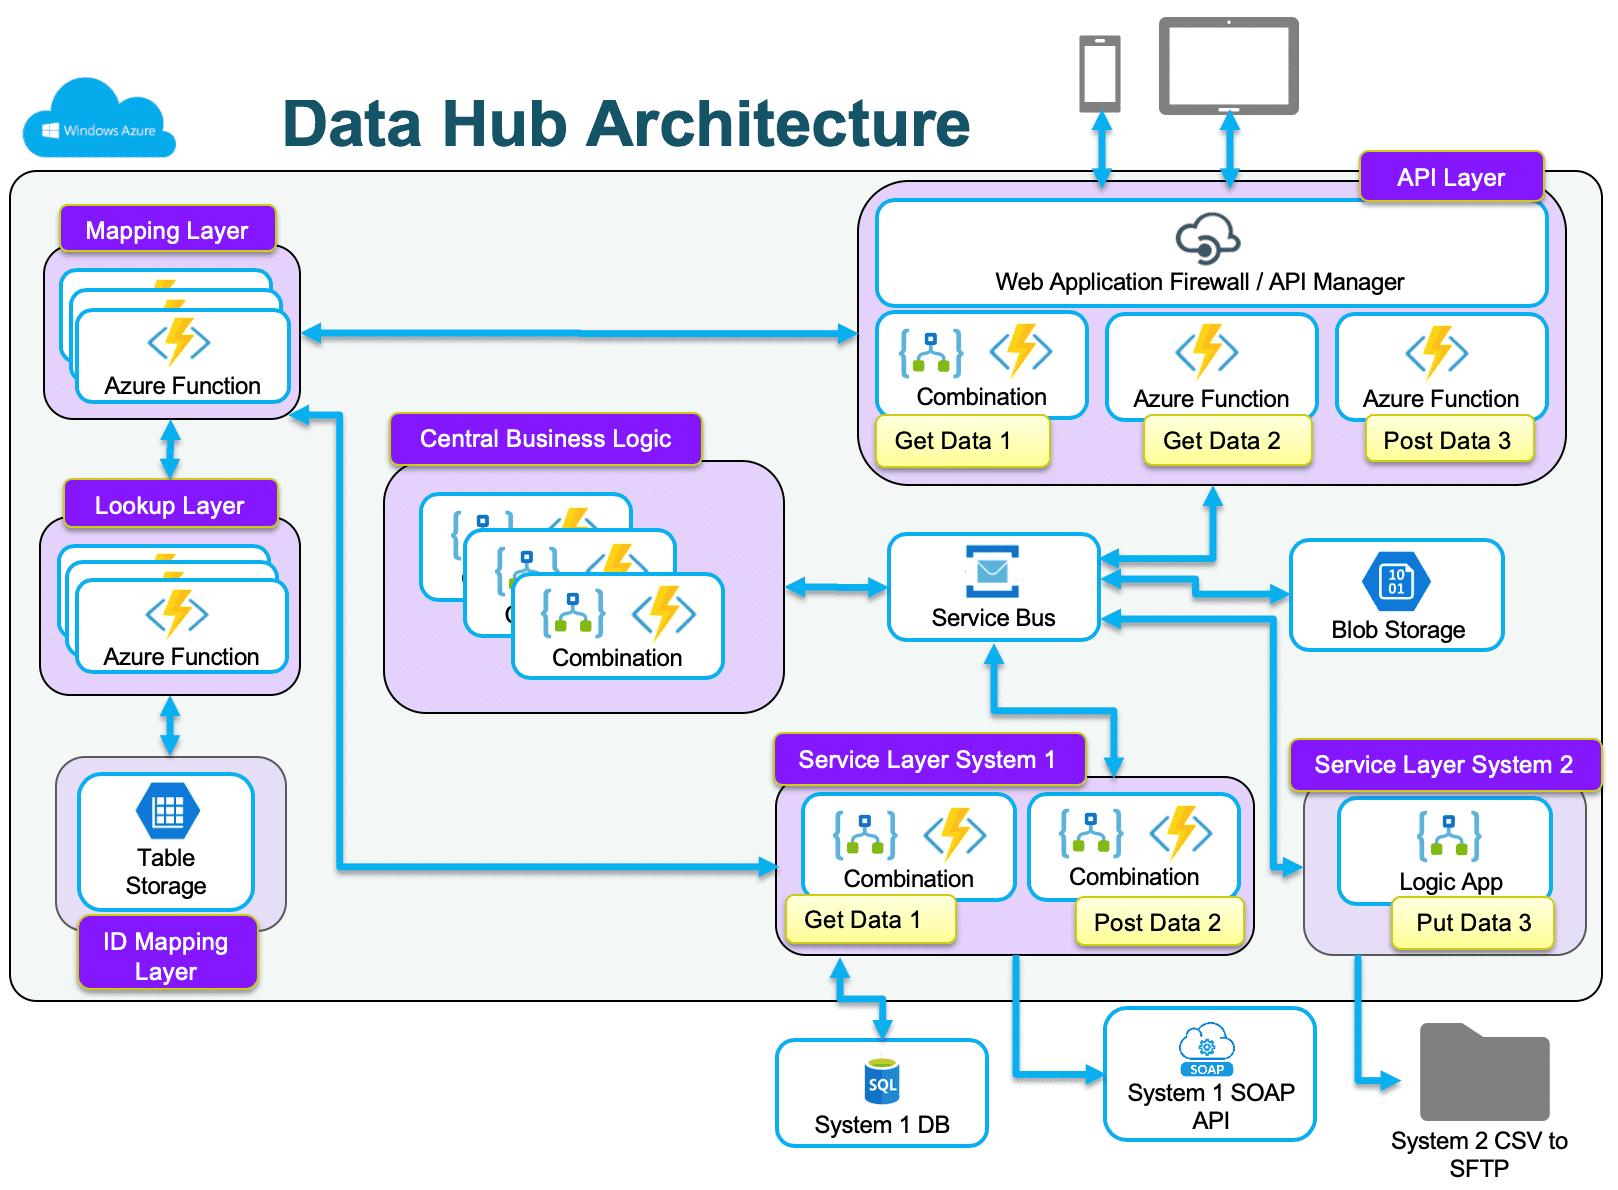 Data Hub Architecture